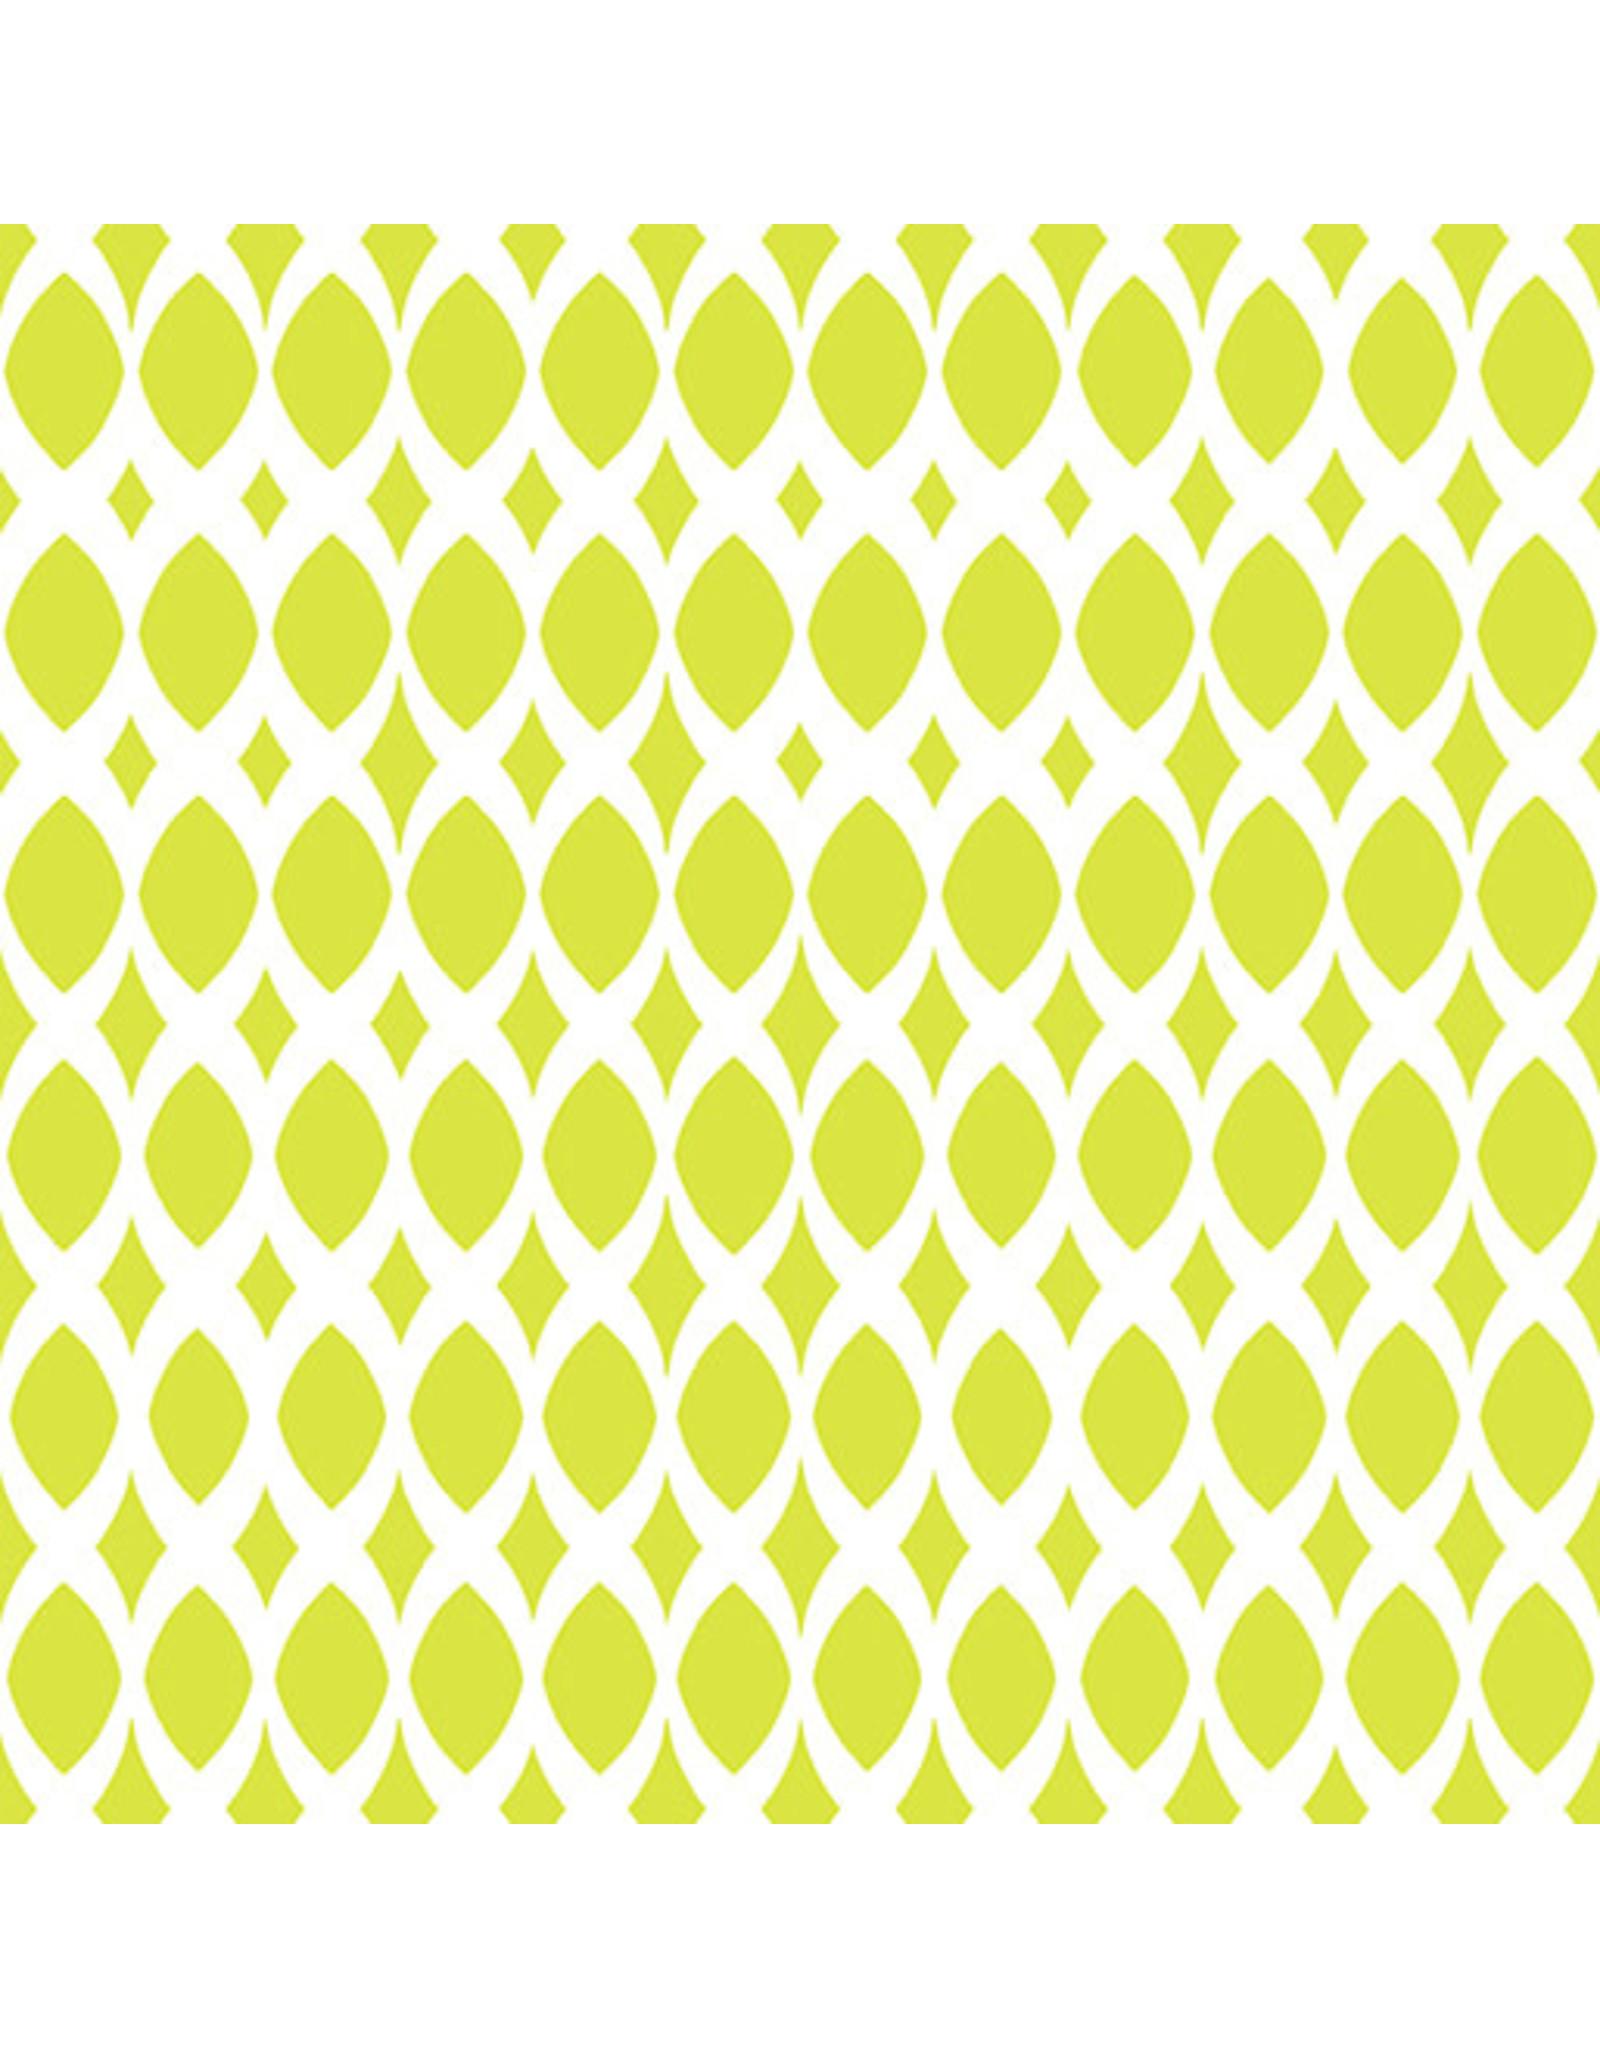 Contempo Gridwork - Diamond Ovals Citron